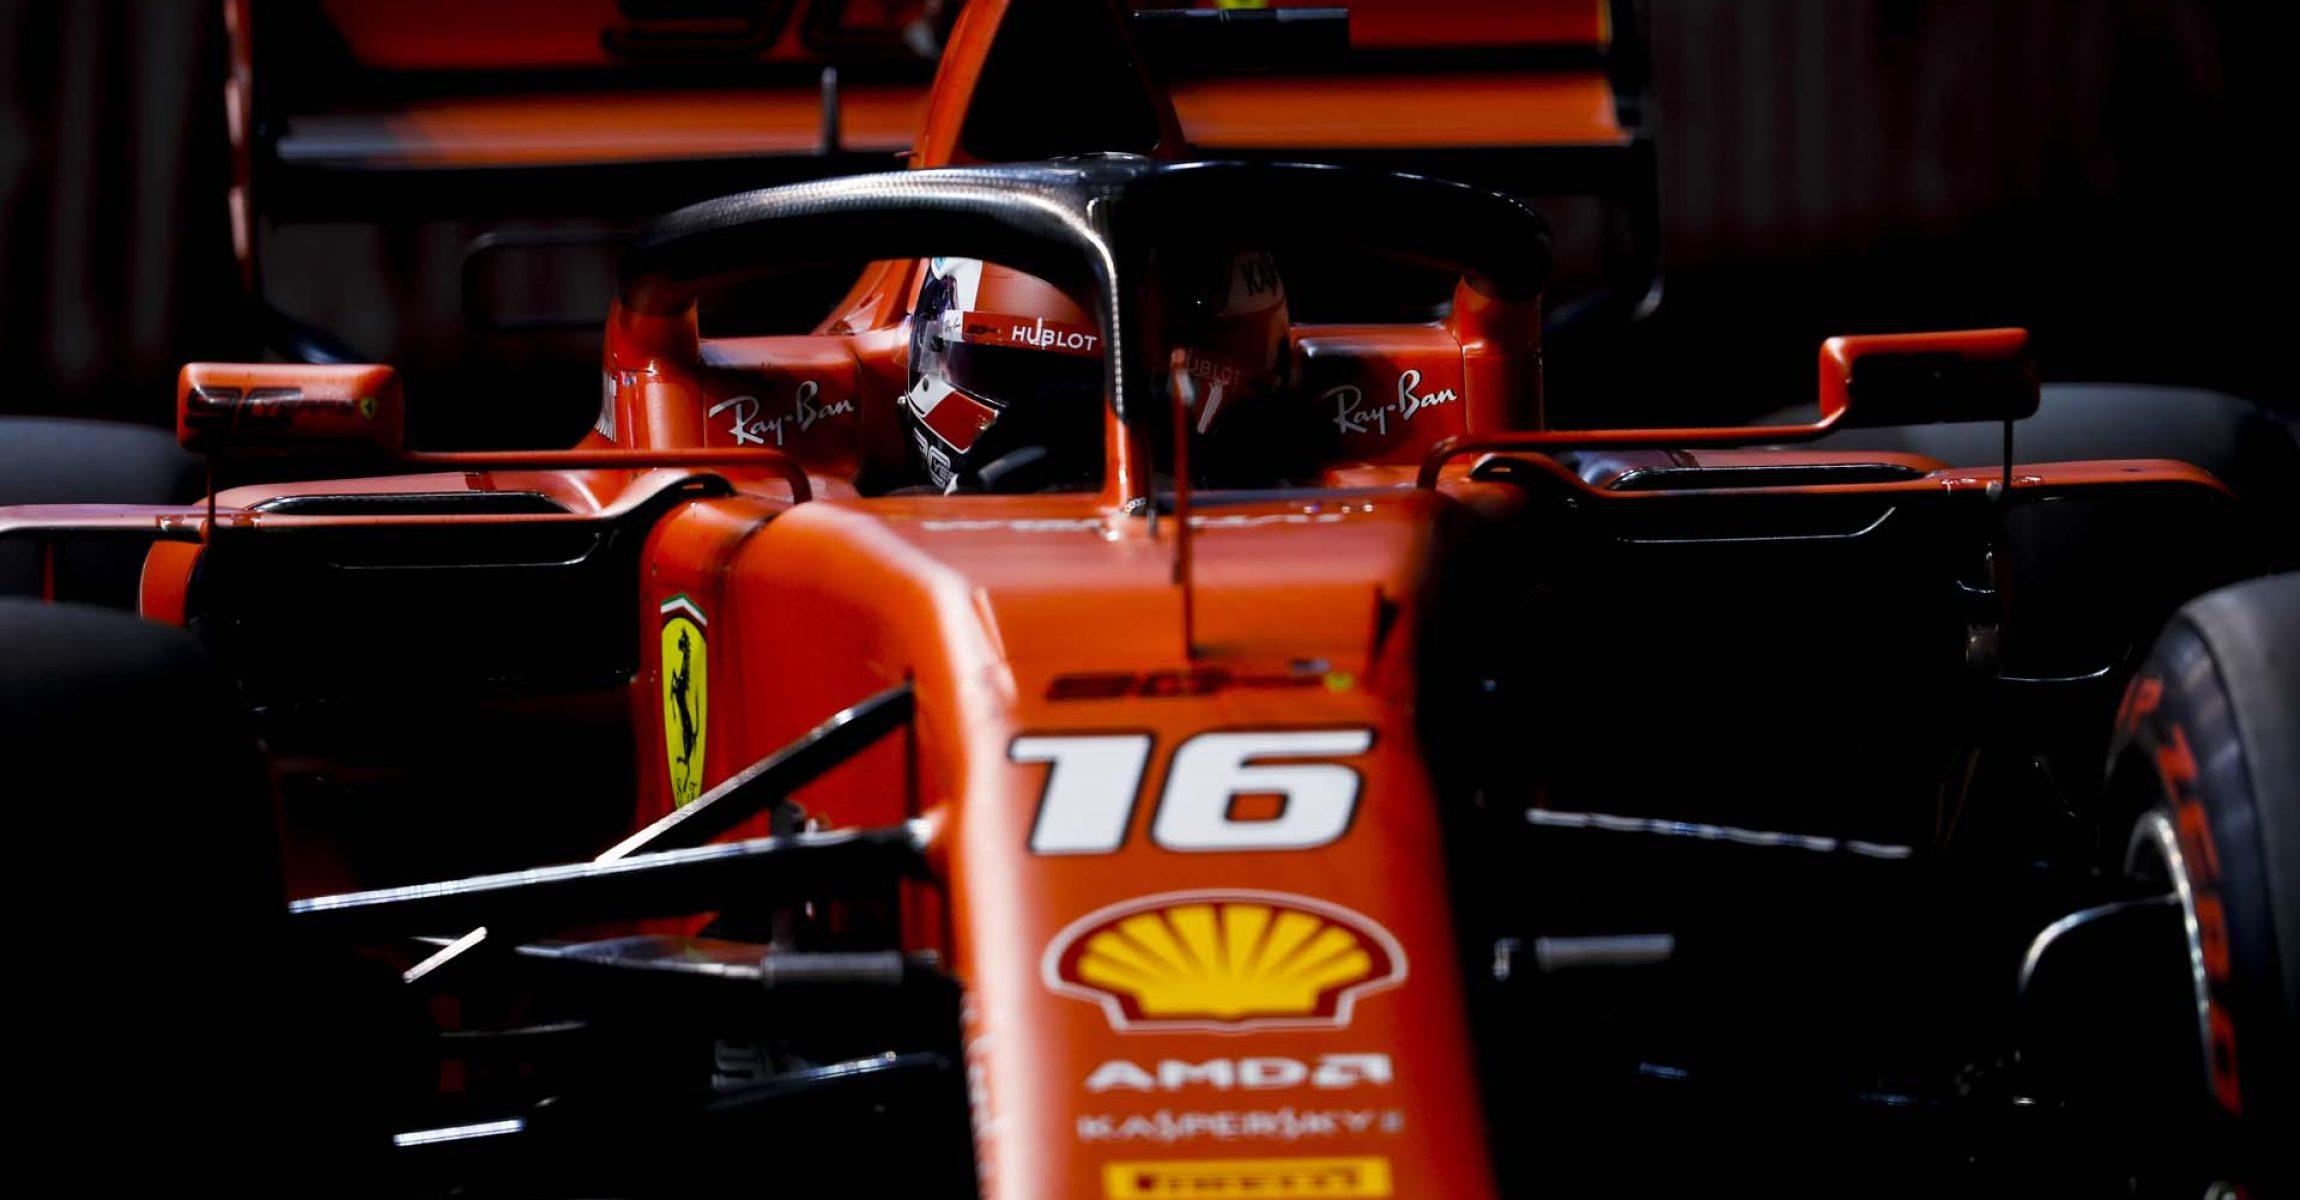 SINGAPORE STREET CIRCUIT, SINGAPORE - SEPTEMBER 21: Charles Leclerc, Ferrari SF90 during the Singapore GP at Singapore Street Circuit on September 21, 2019 in Singapore Street Circuit, Singapore. (Photo by Zak Mauger / LAT Images)